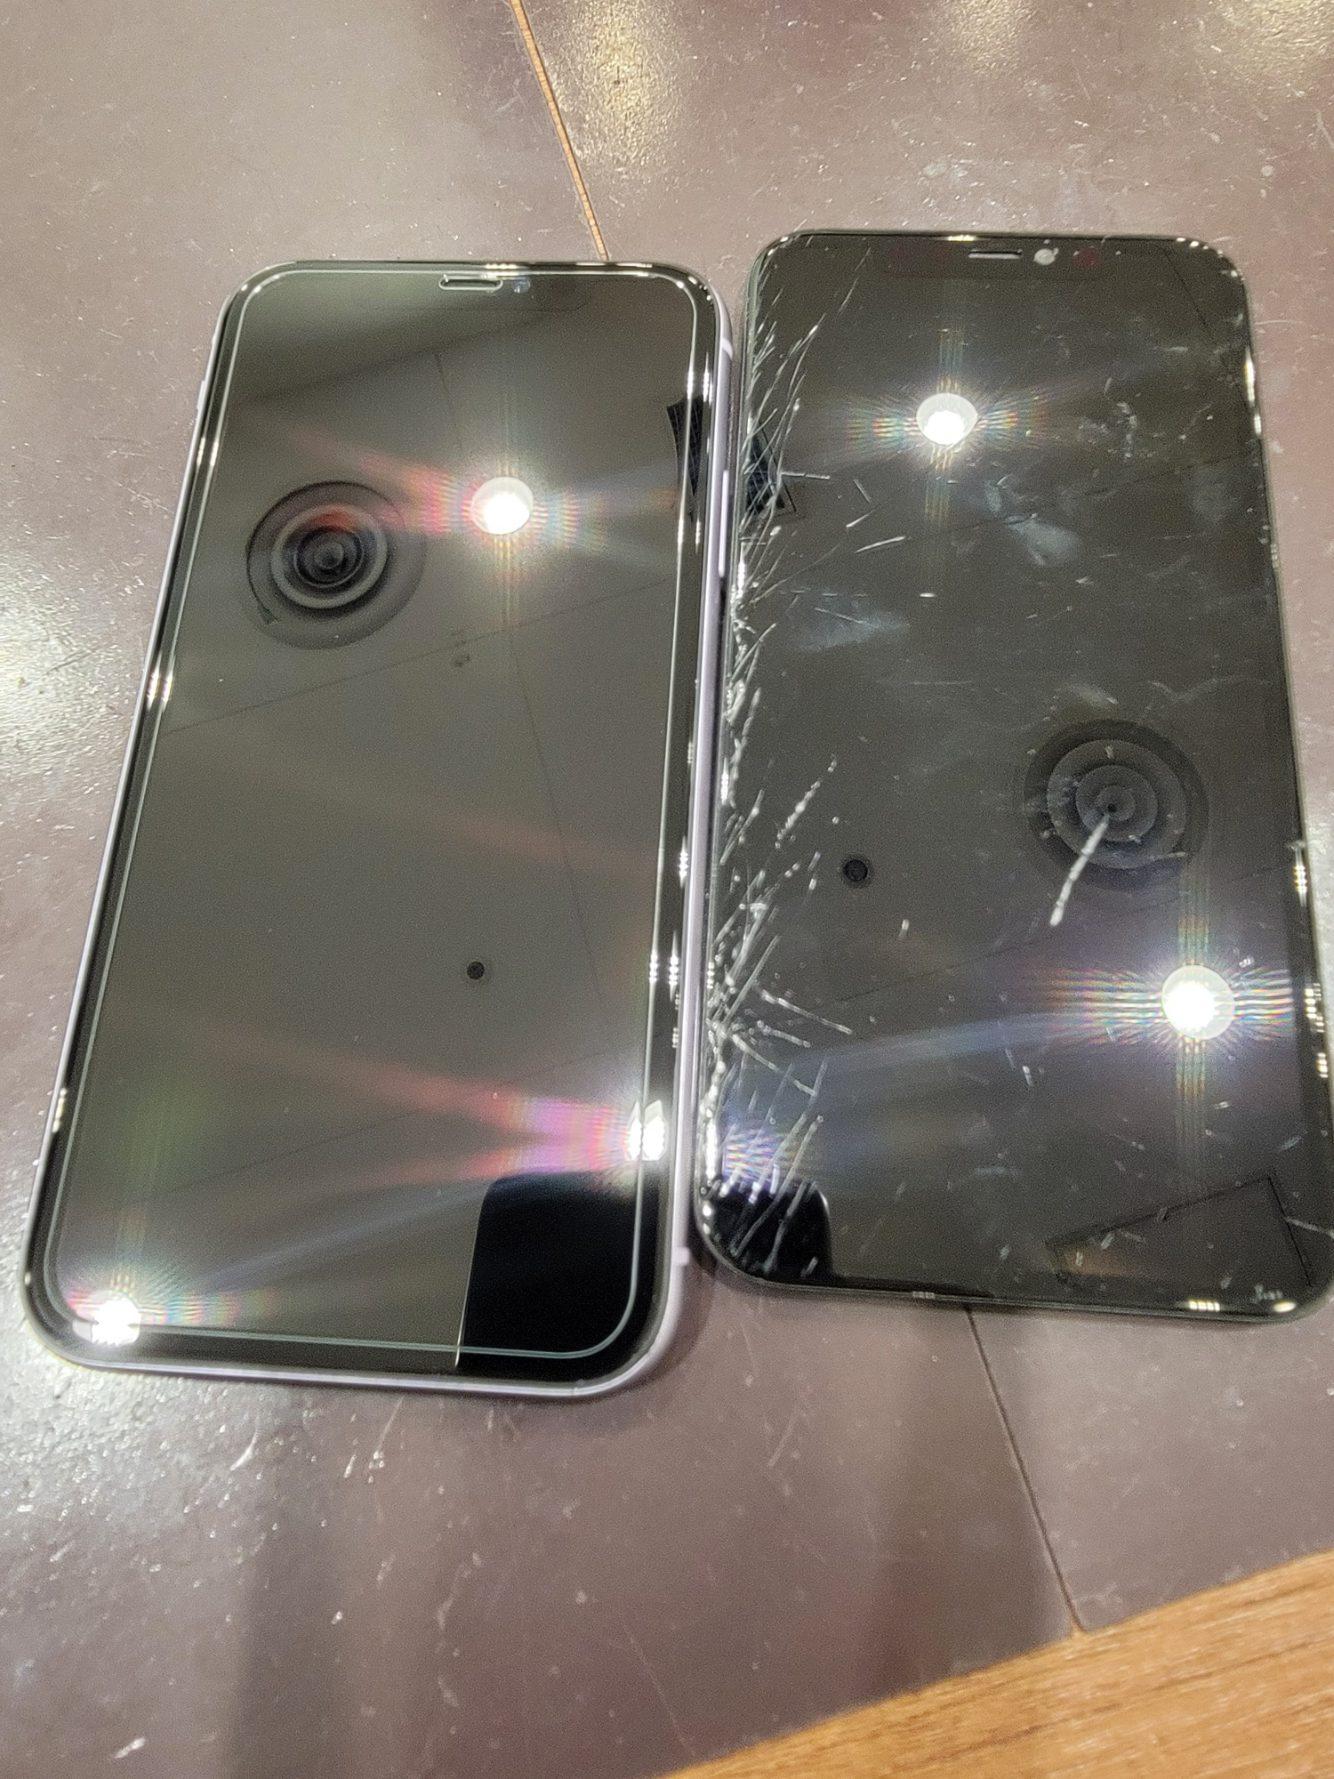 iPhoneXS / 画面割れ交換 / 垂水区からご来店